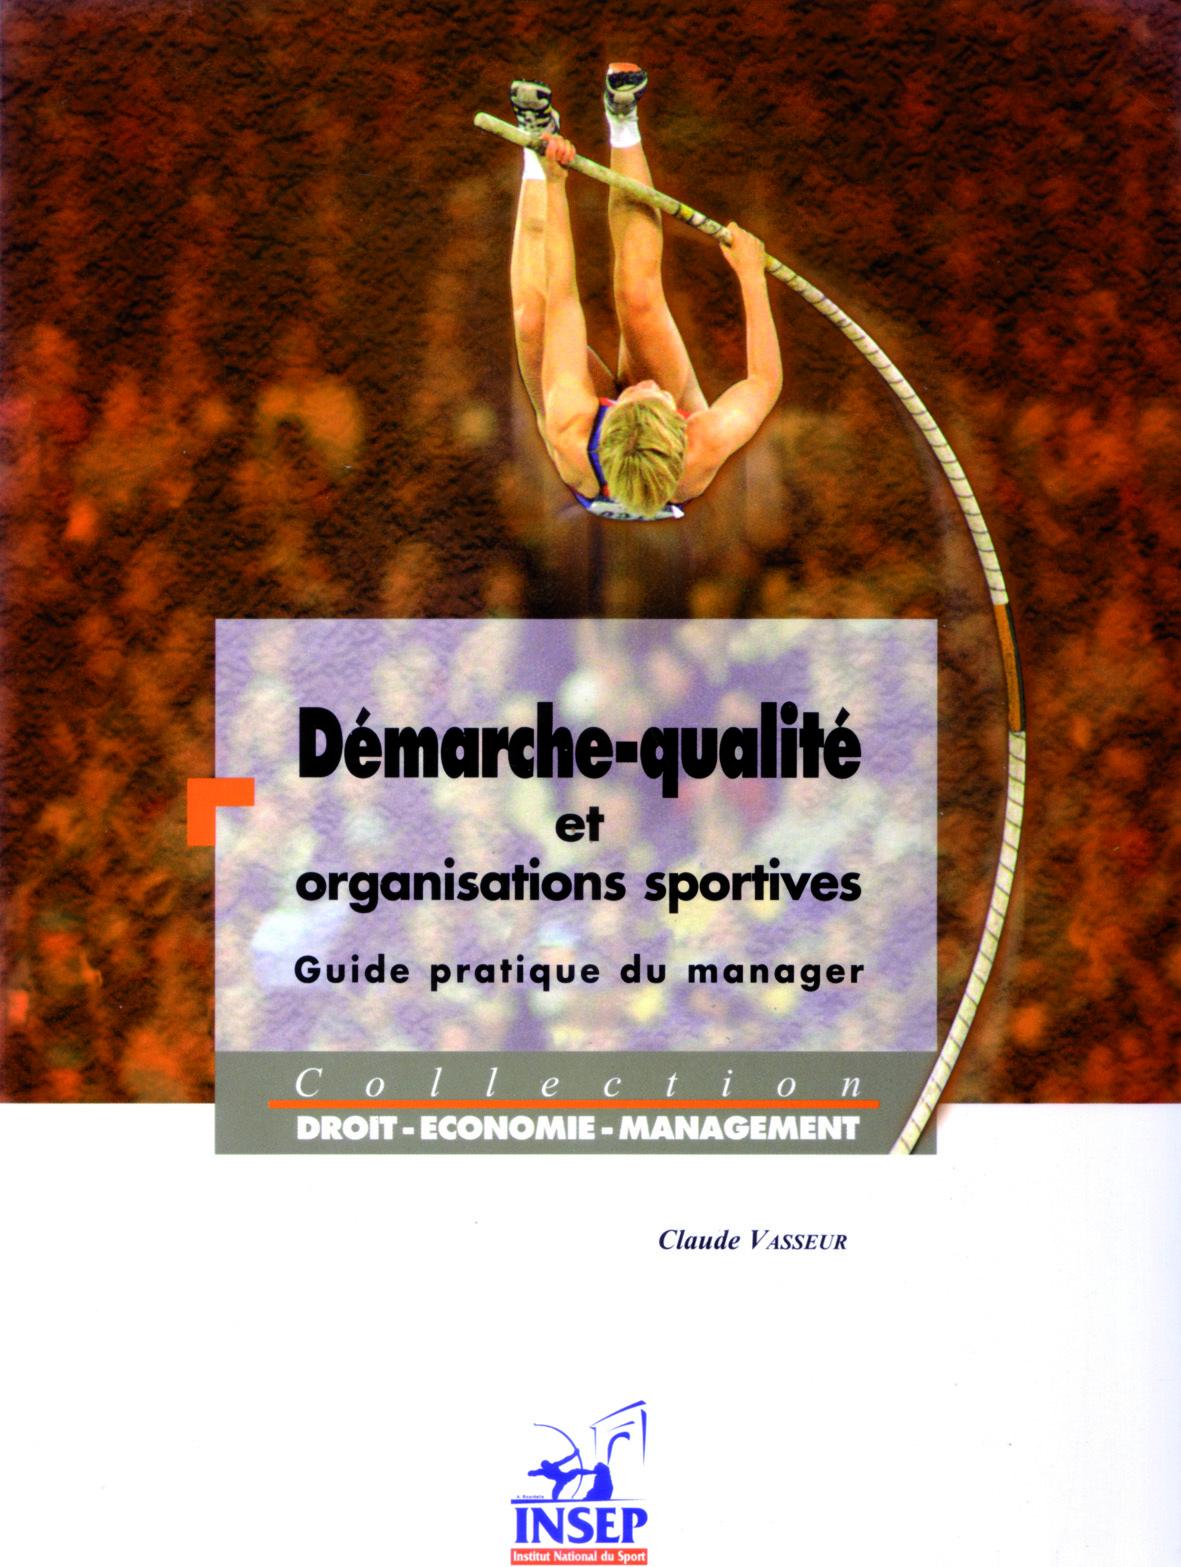 DEMARCHE-QUALITE ET ORGANISATIONS SPORTIVES GUIDE PRATIQUE DU MANAGER